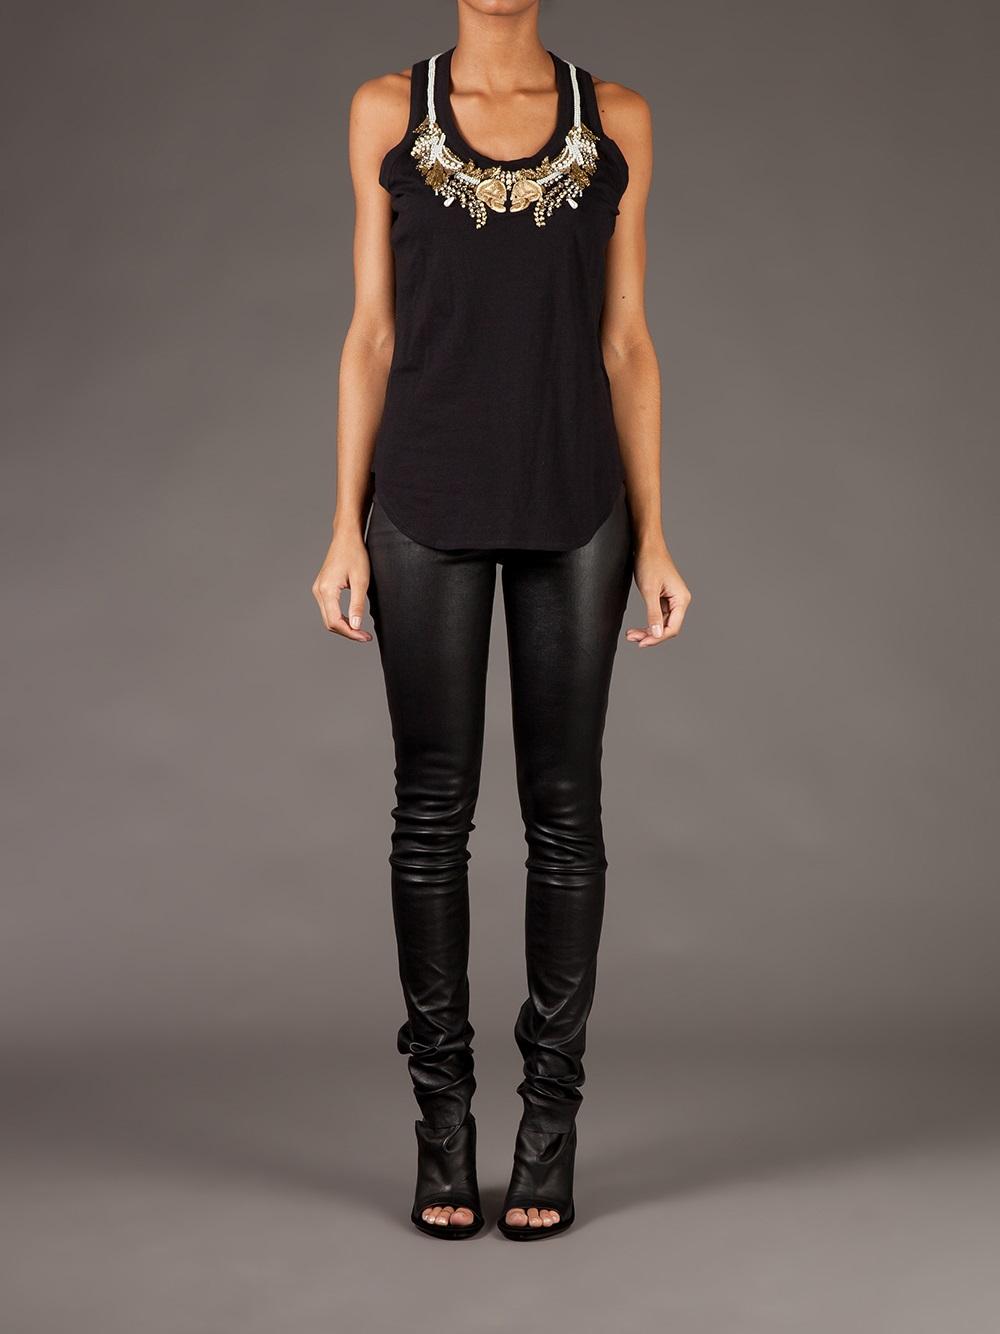 3ff78adb56cf0 Lyst - Alexander McQueen Embellished Vest Top in Black